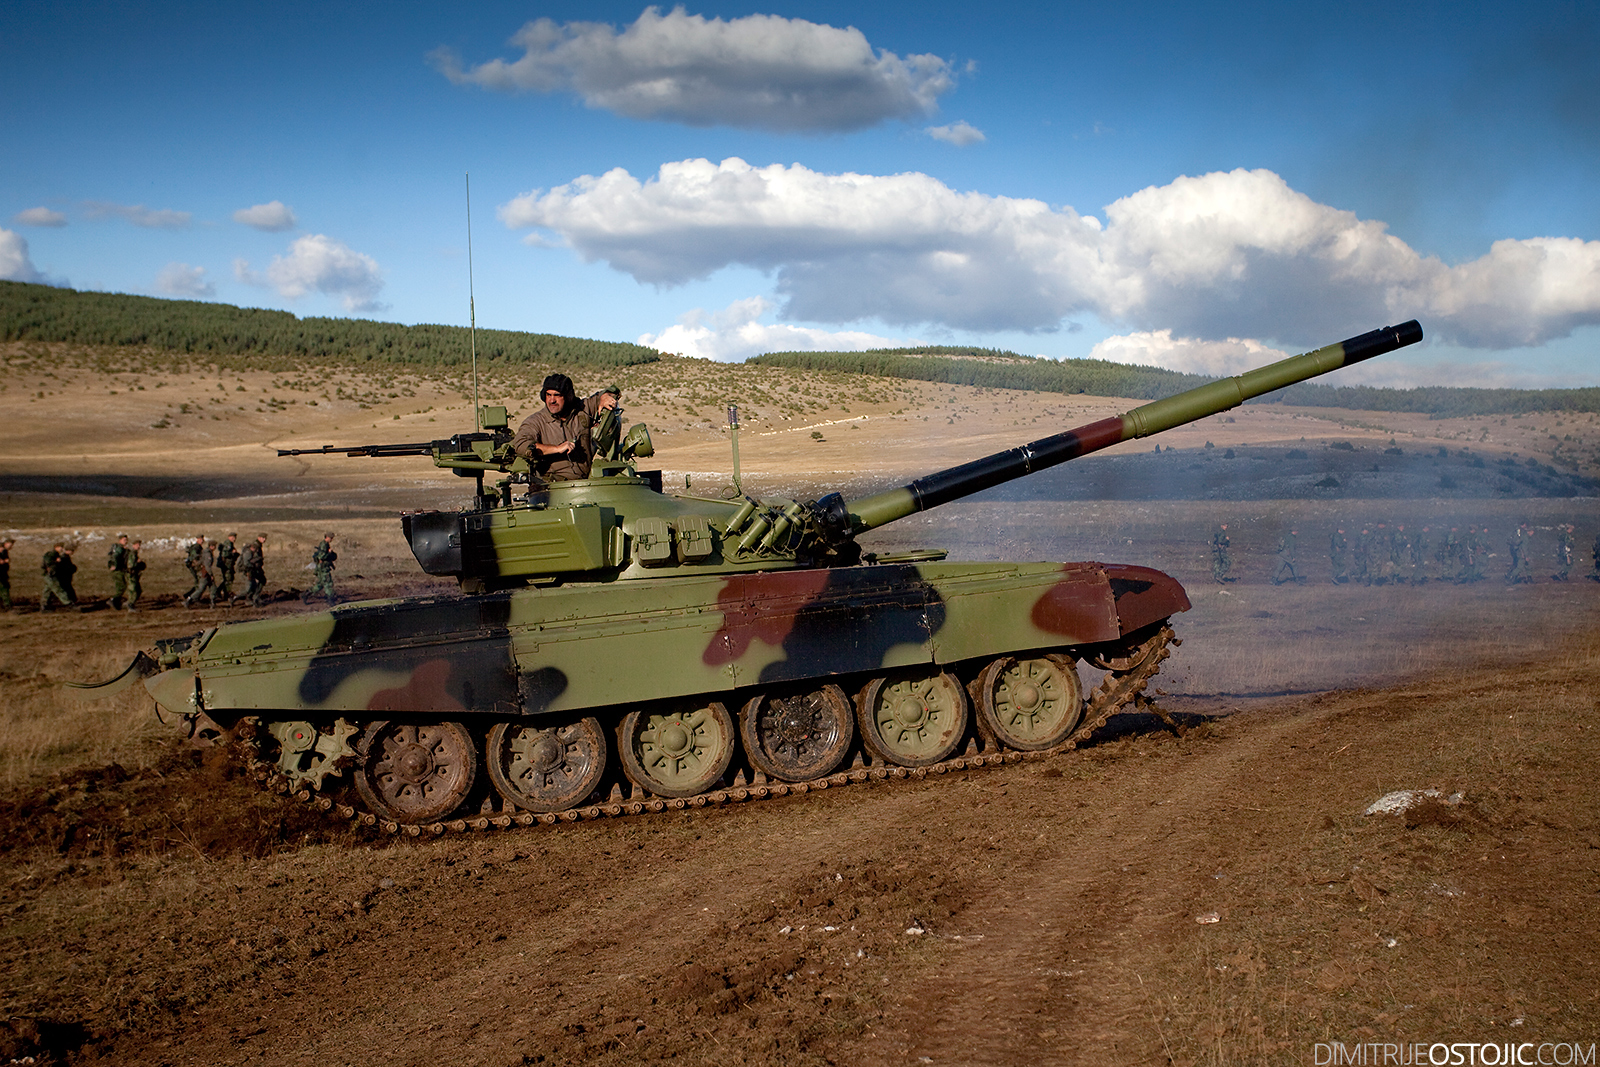 M-84 Serbian Army ,military exercise Odlucan Odgovor 2009, Serbia, Pesterska visoravan, Oktobar 2009 © www.dimitrijeostojic.com